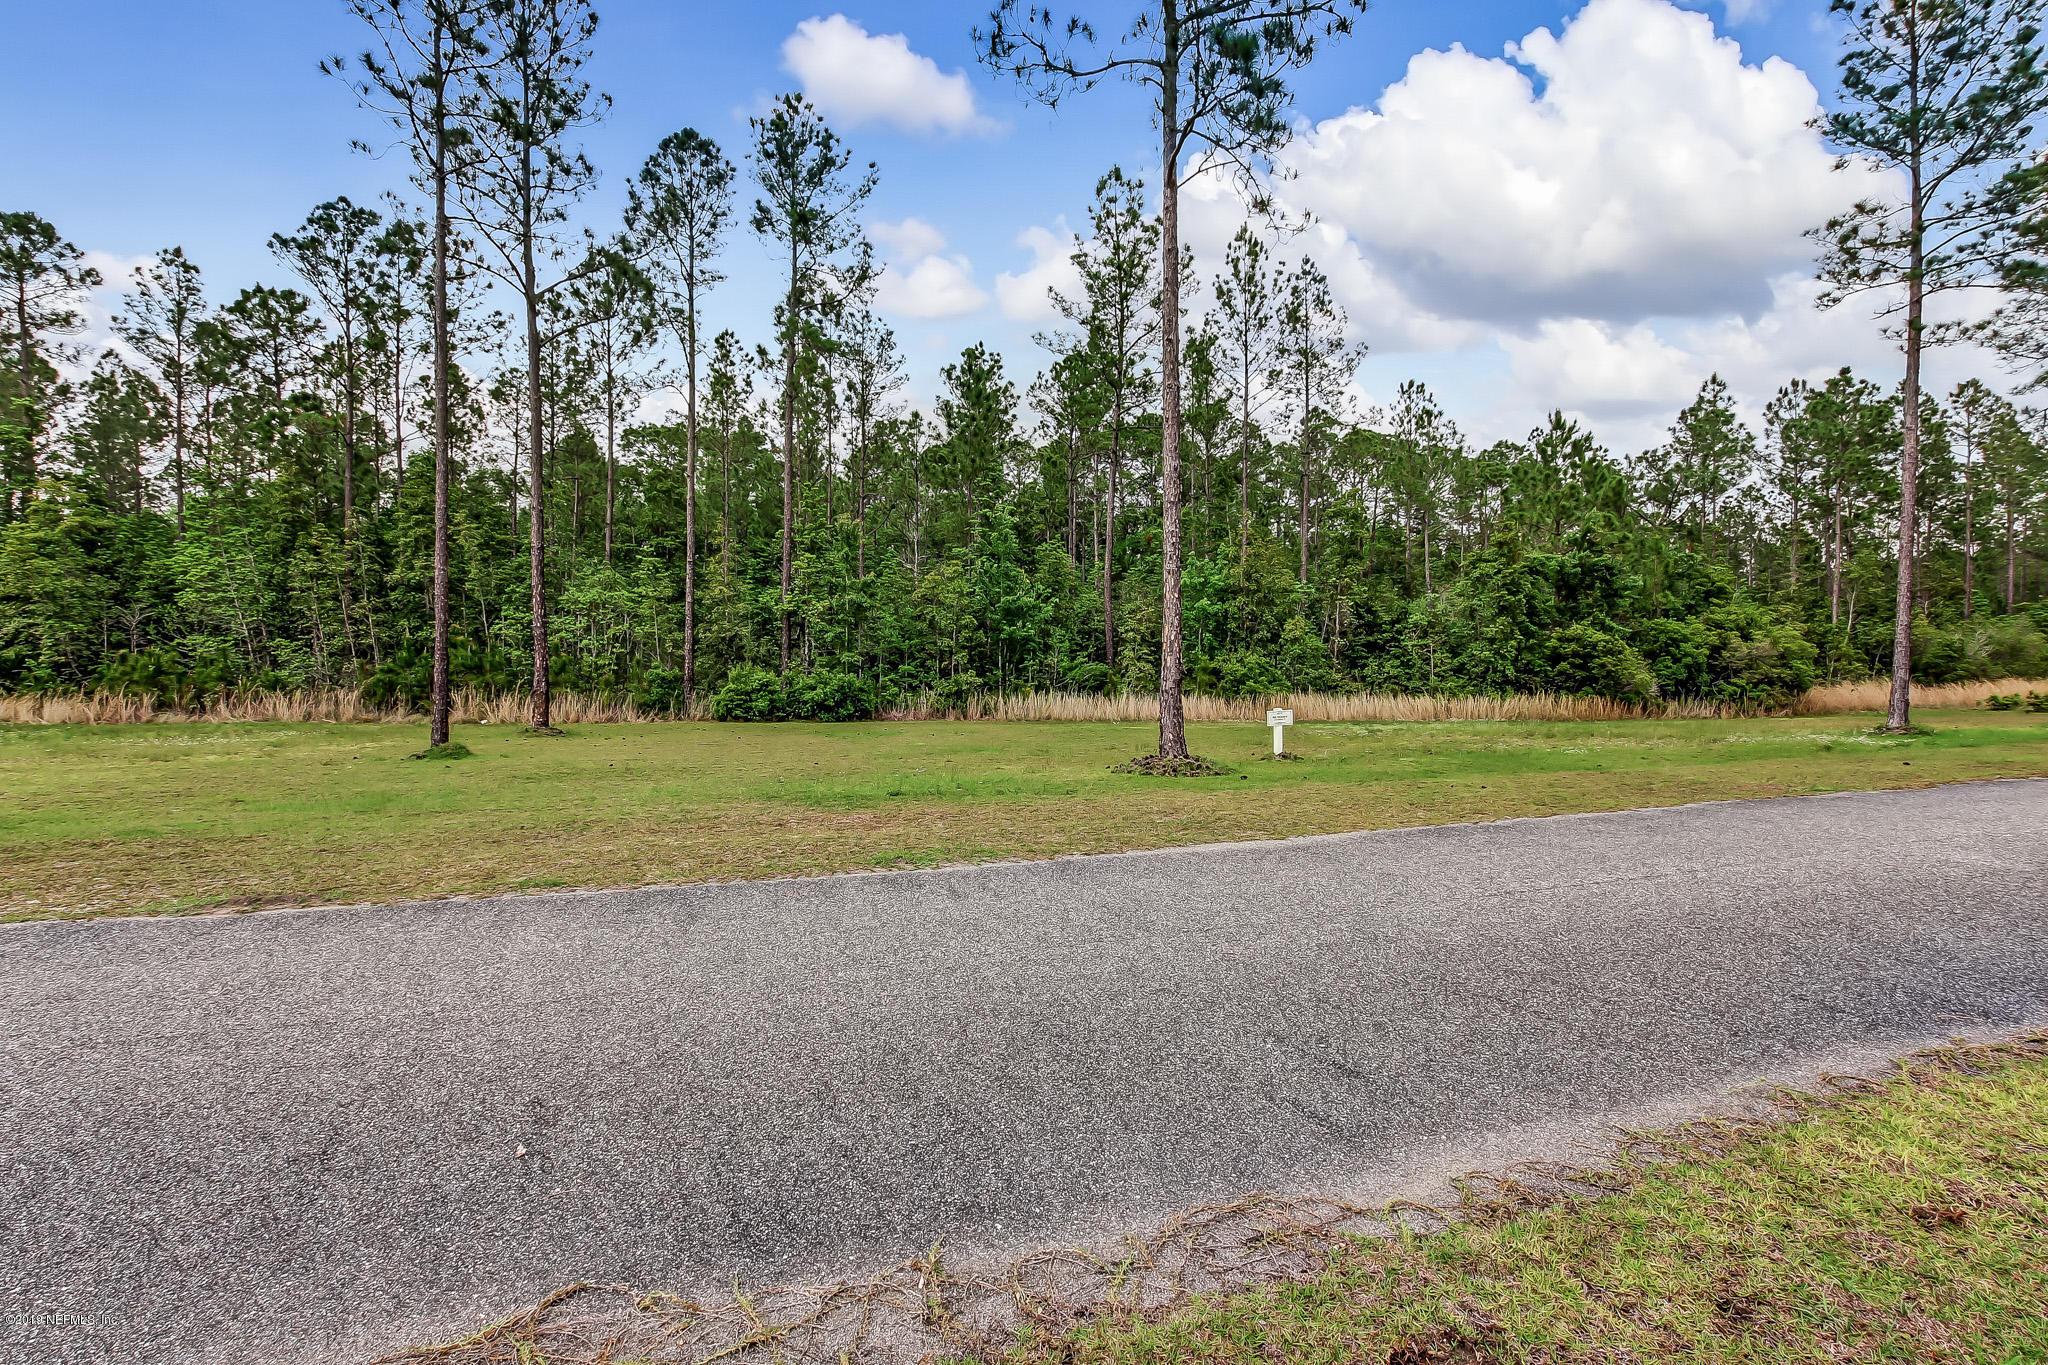 9979 PRESERVES, JACKSONVILLE, FLORIDA 32219, ,Vacant land,For sale,PRESERVES,990409